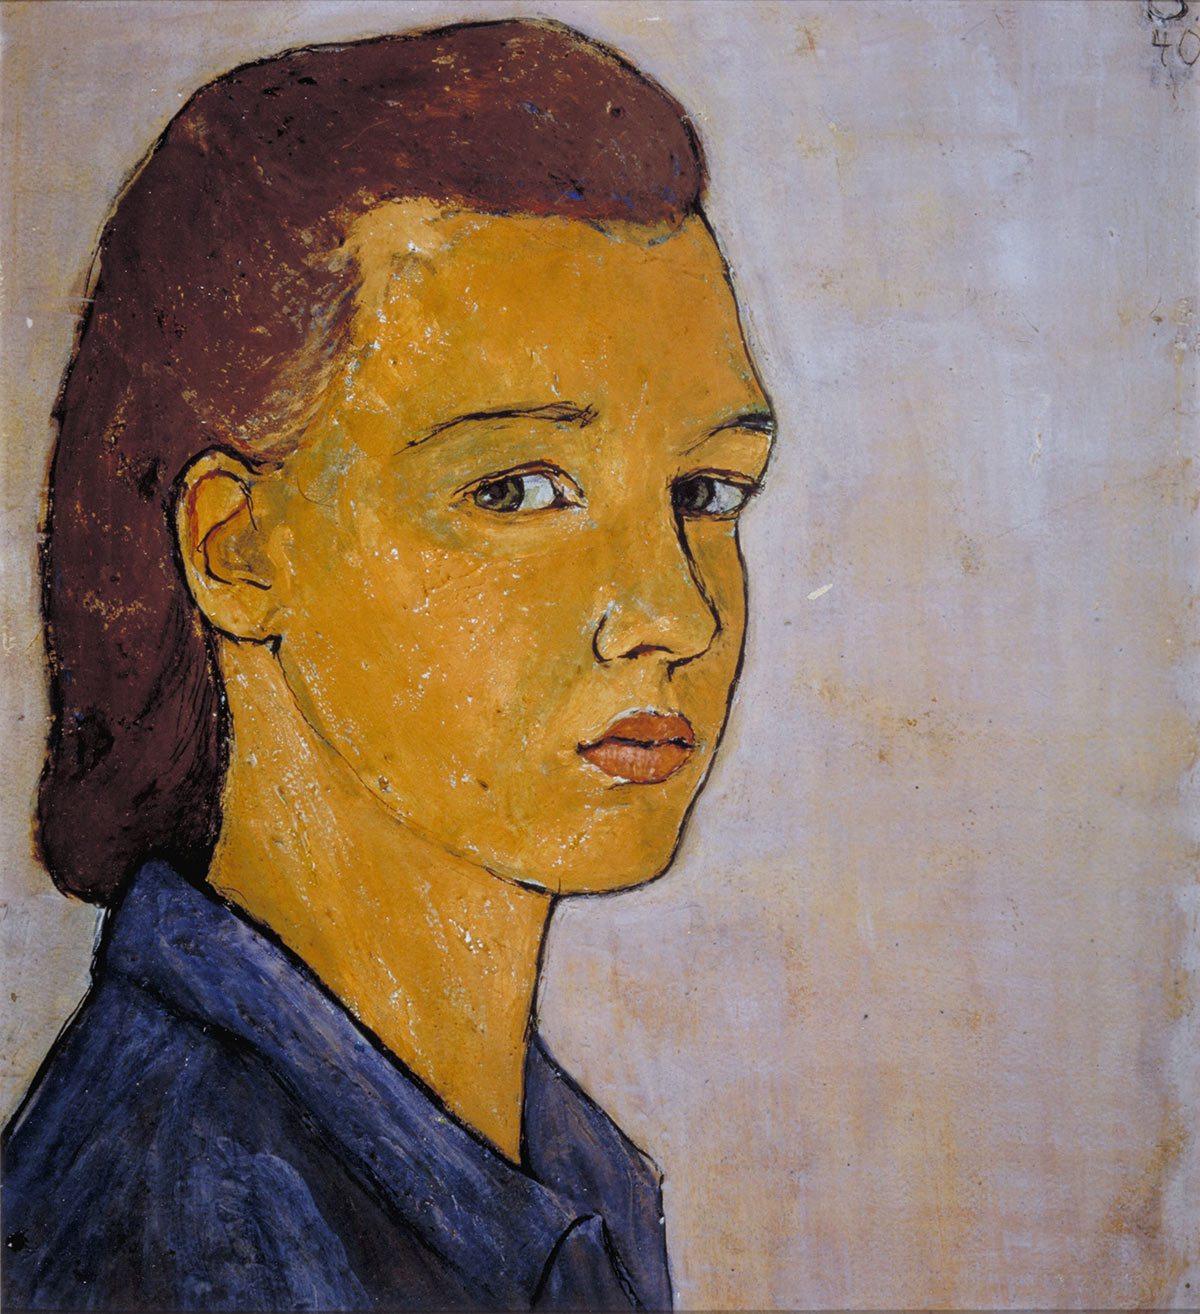 Self-portrait by Charlotte Salomon.